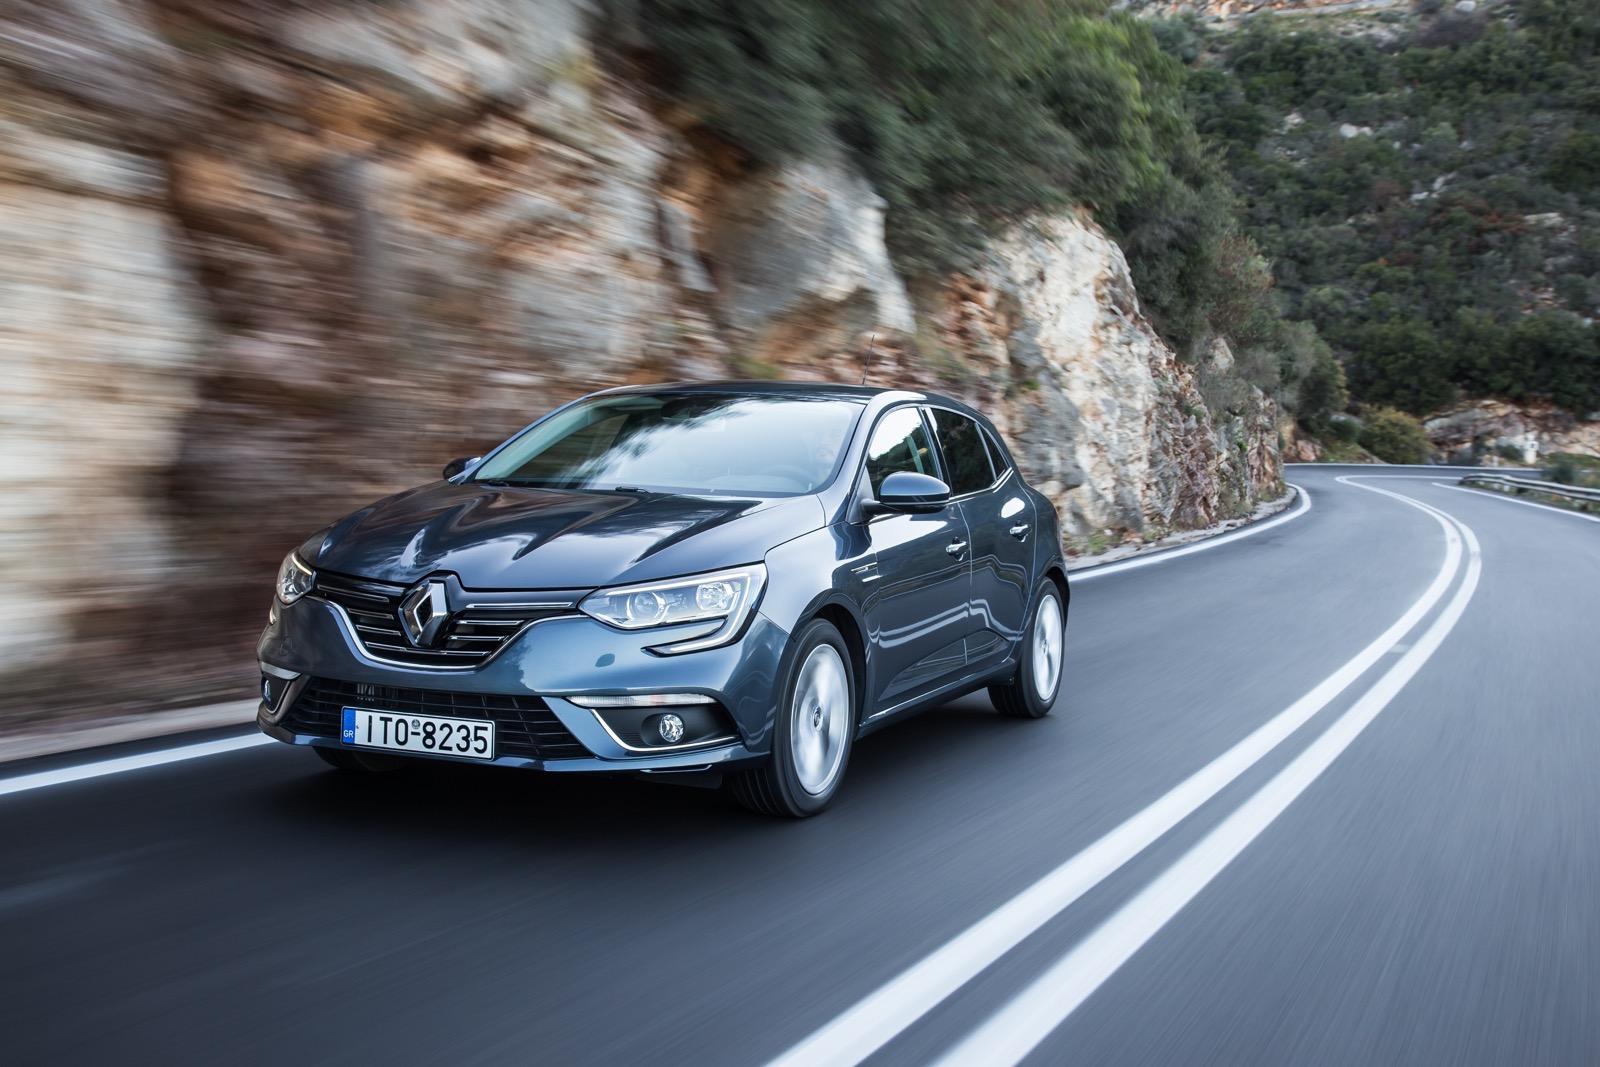 First_Drive_Renault_Megane_131